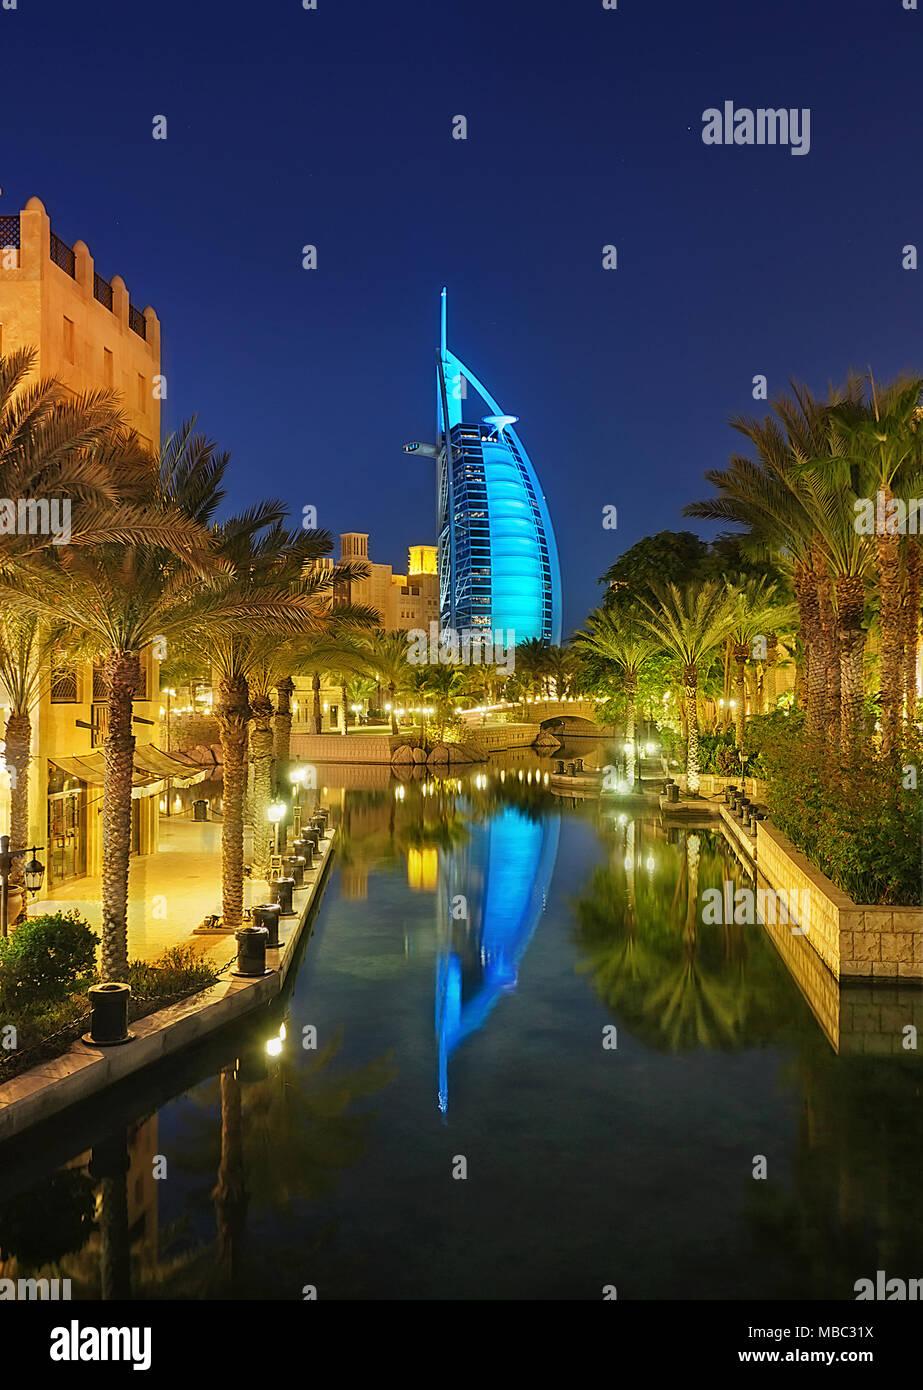 DUBAI, UAE - APR 8, 2013: Famous reflection view with 7 star hotel Burj Al Arab. Night scene with palms. Colorful canal resort. Dubai, United Arab Emi - Stock Image